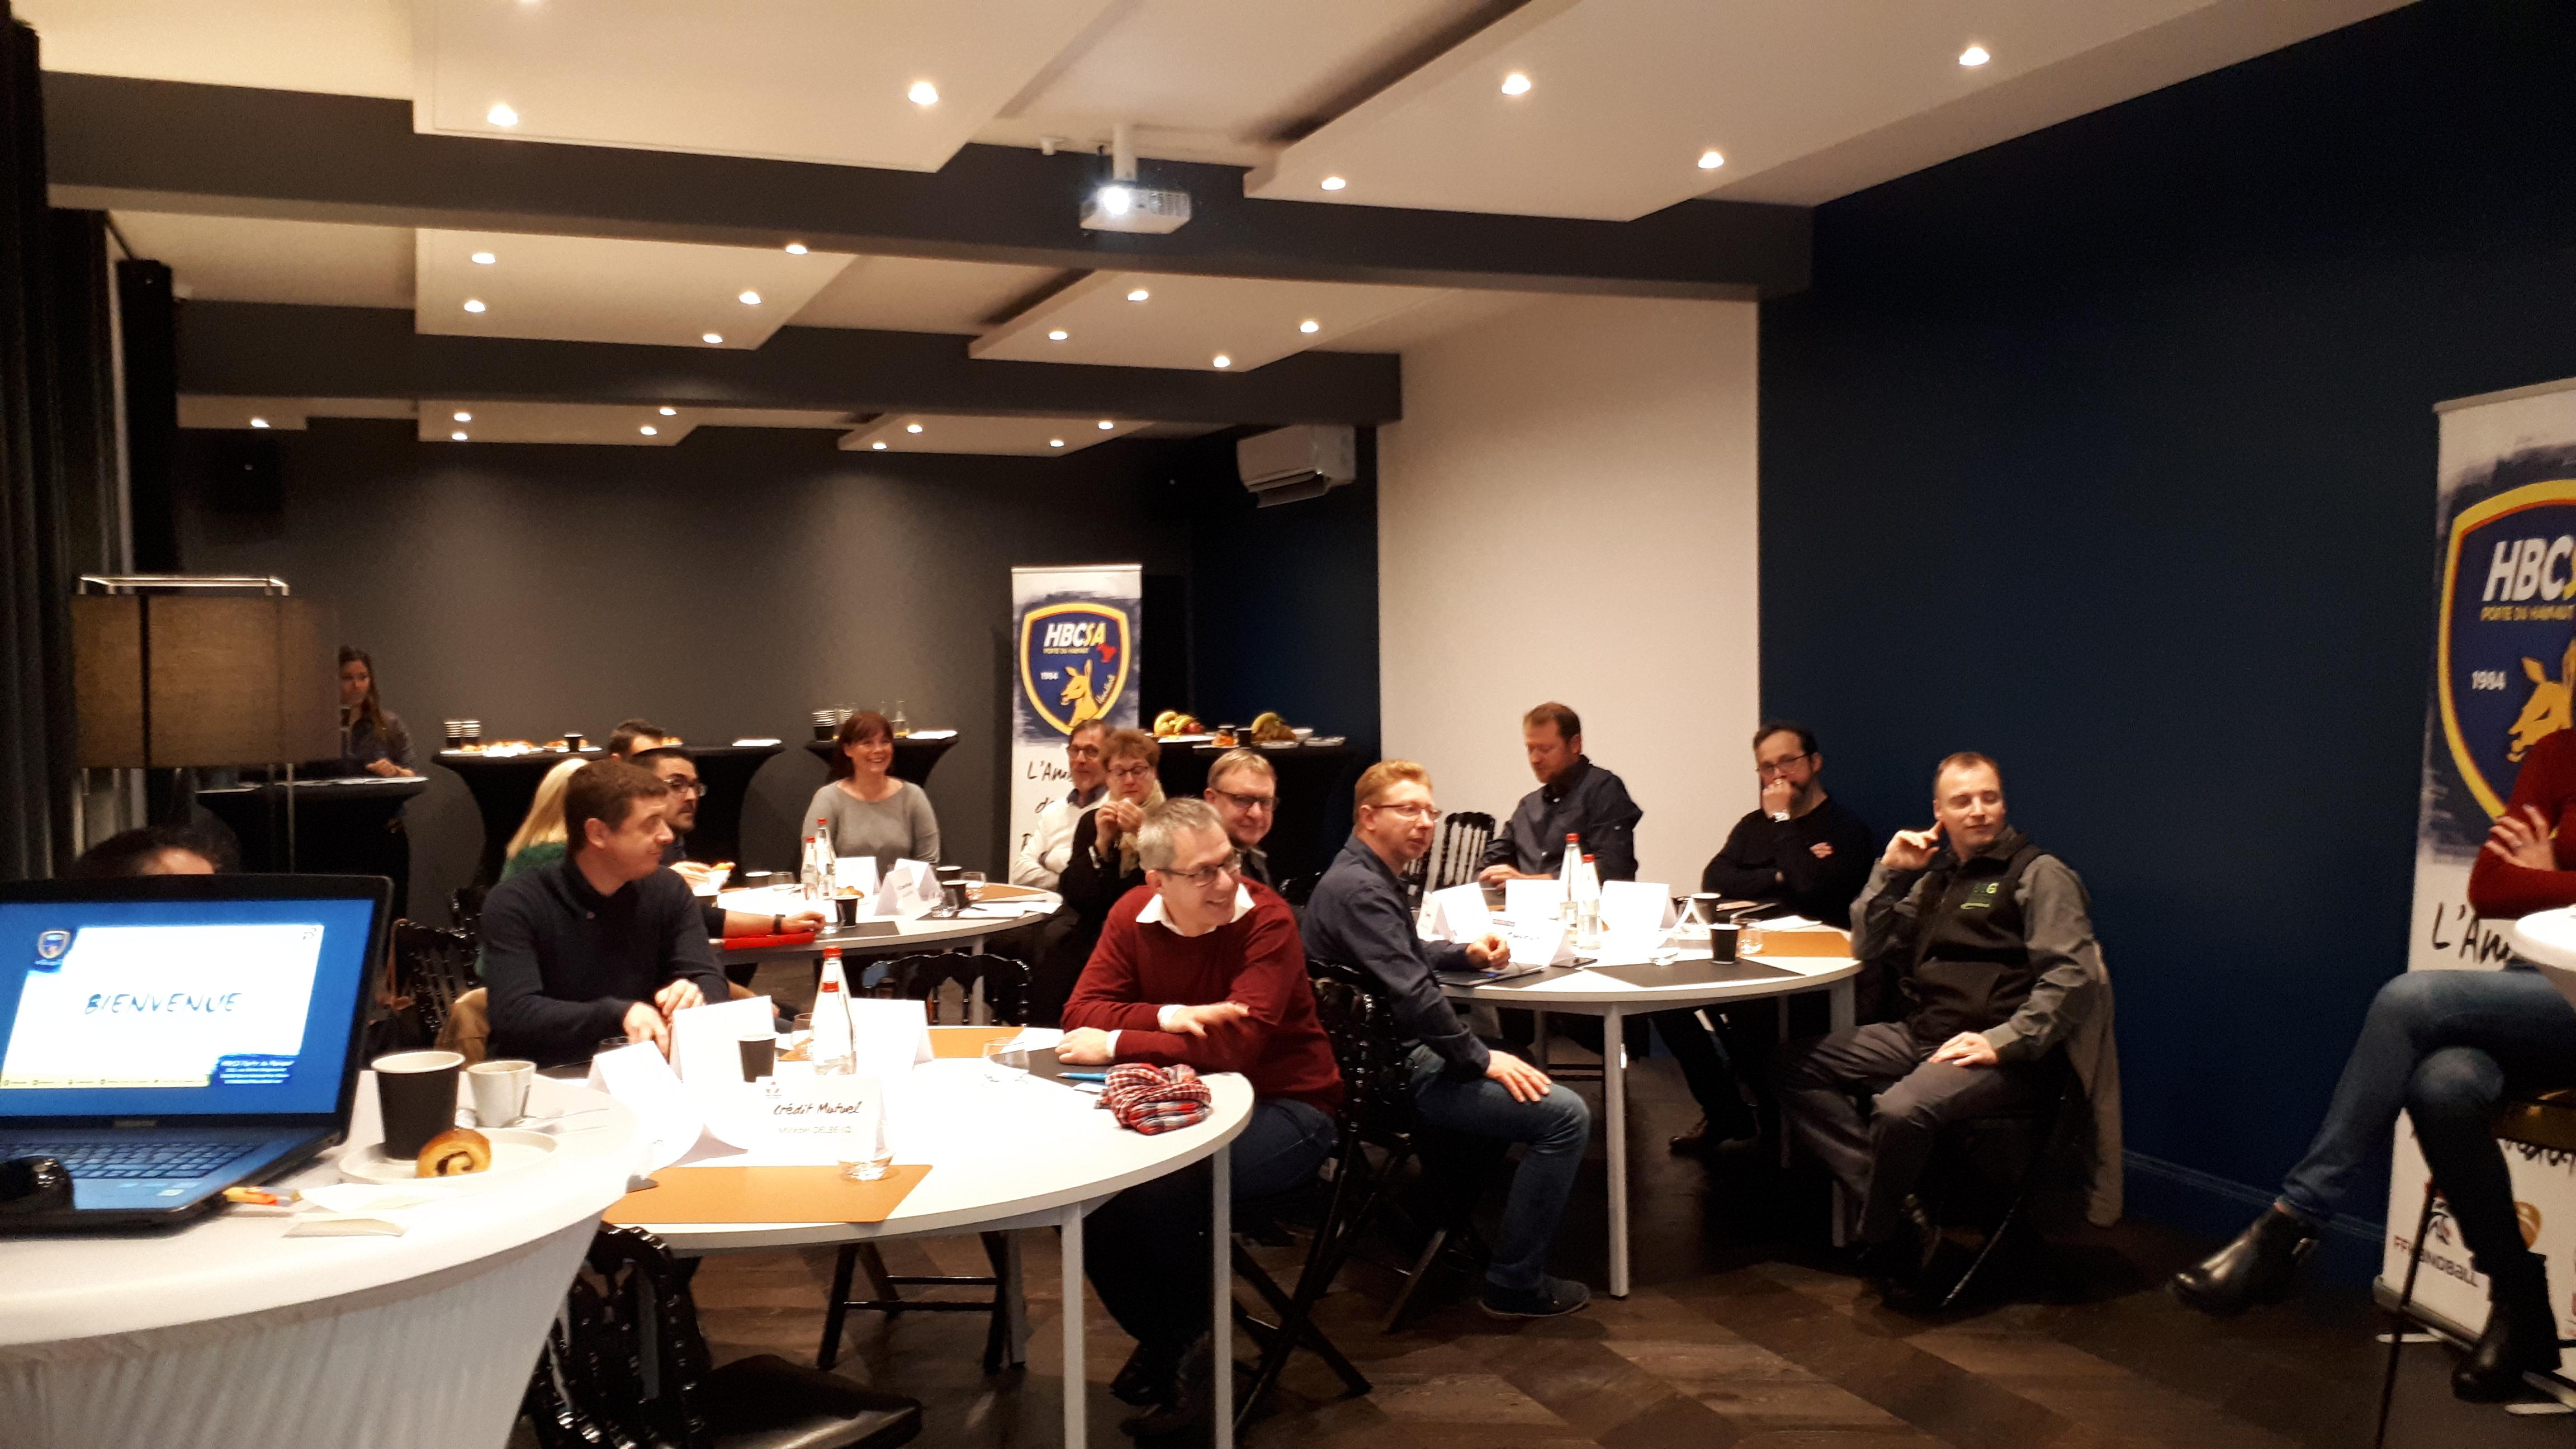 Le HBCSA-PH organise son premier Work-Café !